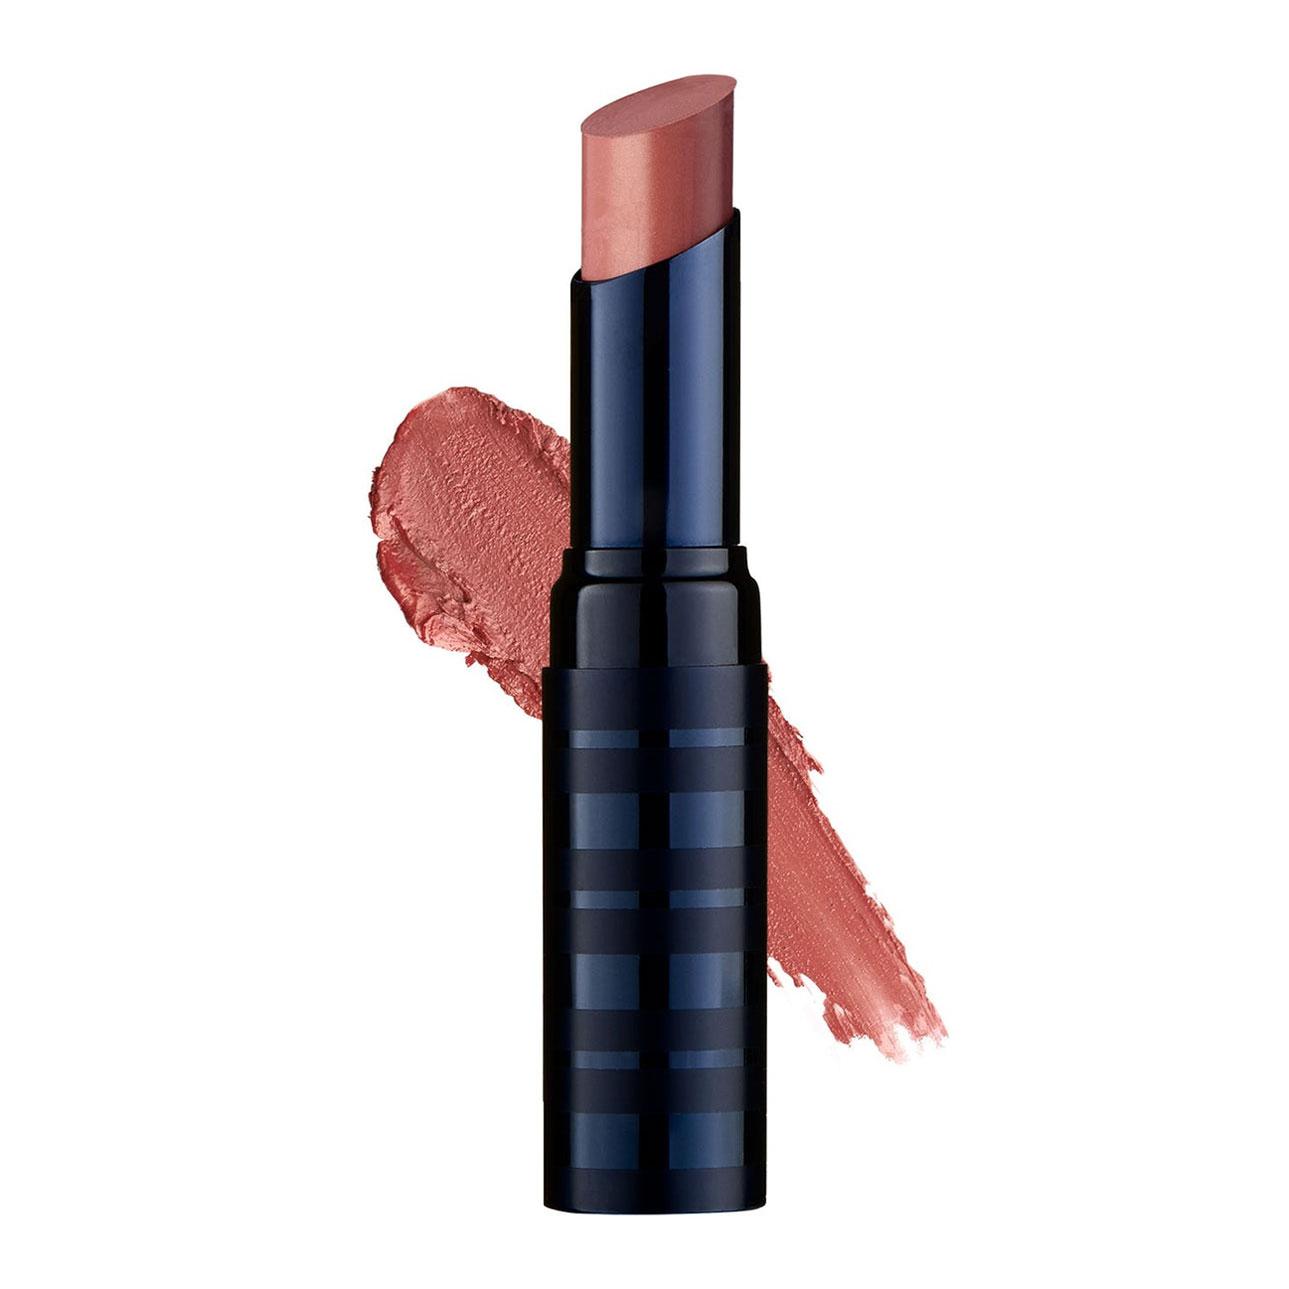 Color Intense Lipstick in Brunch